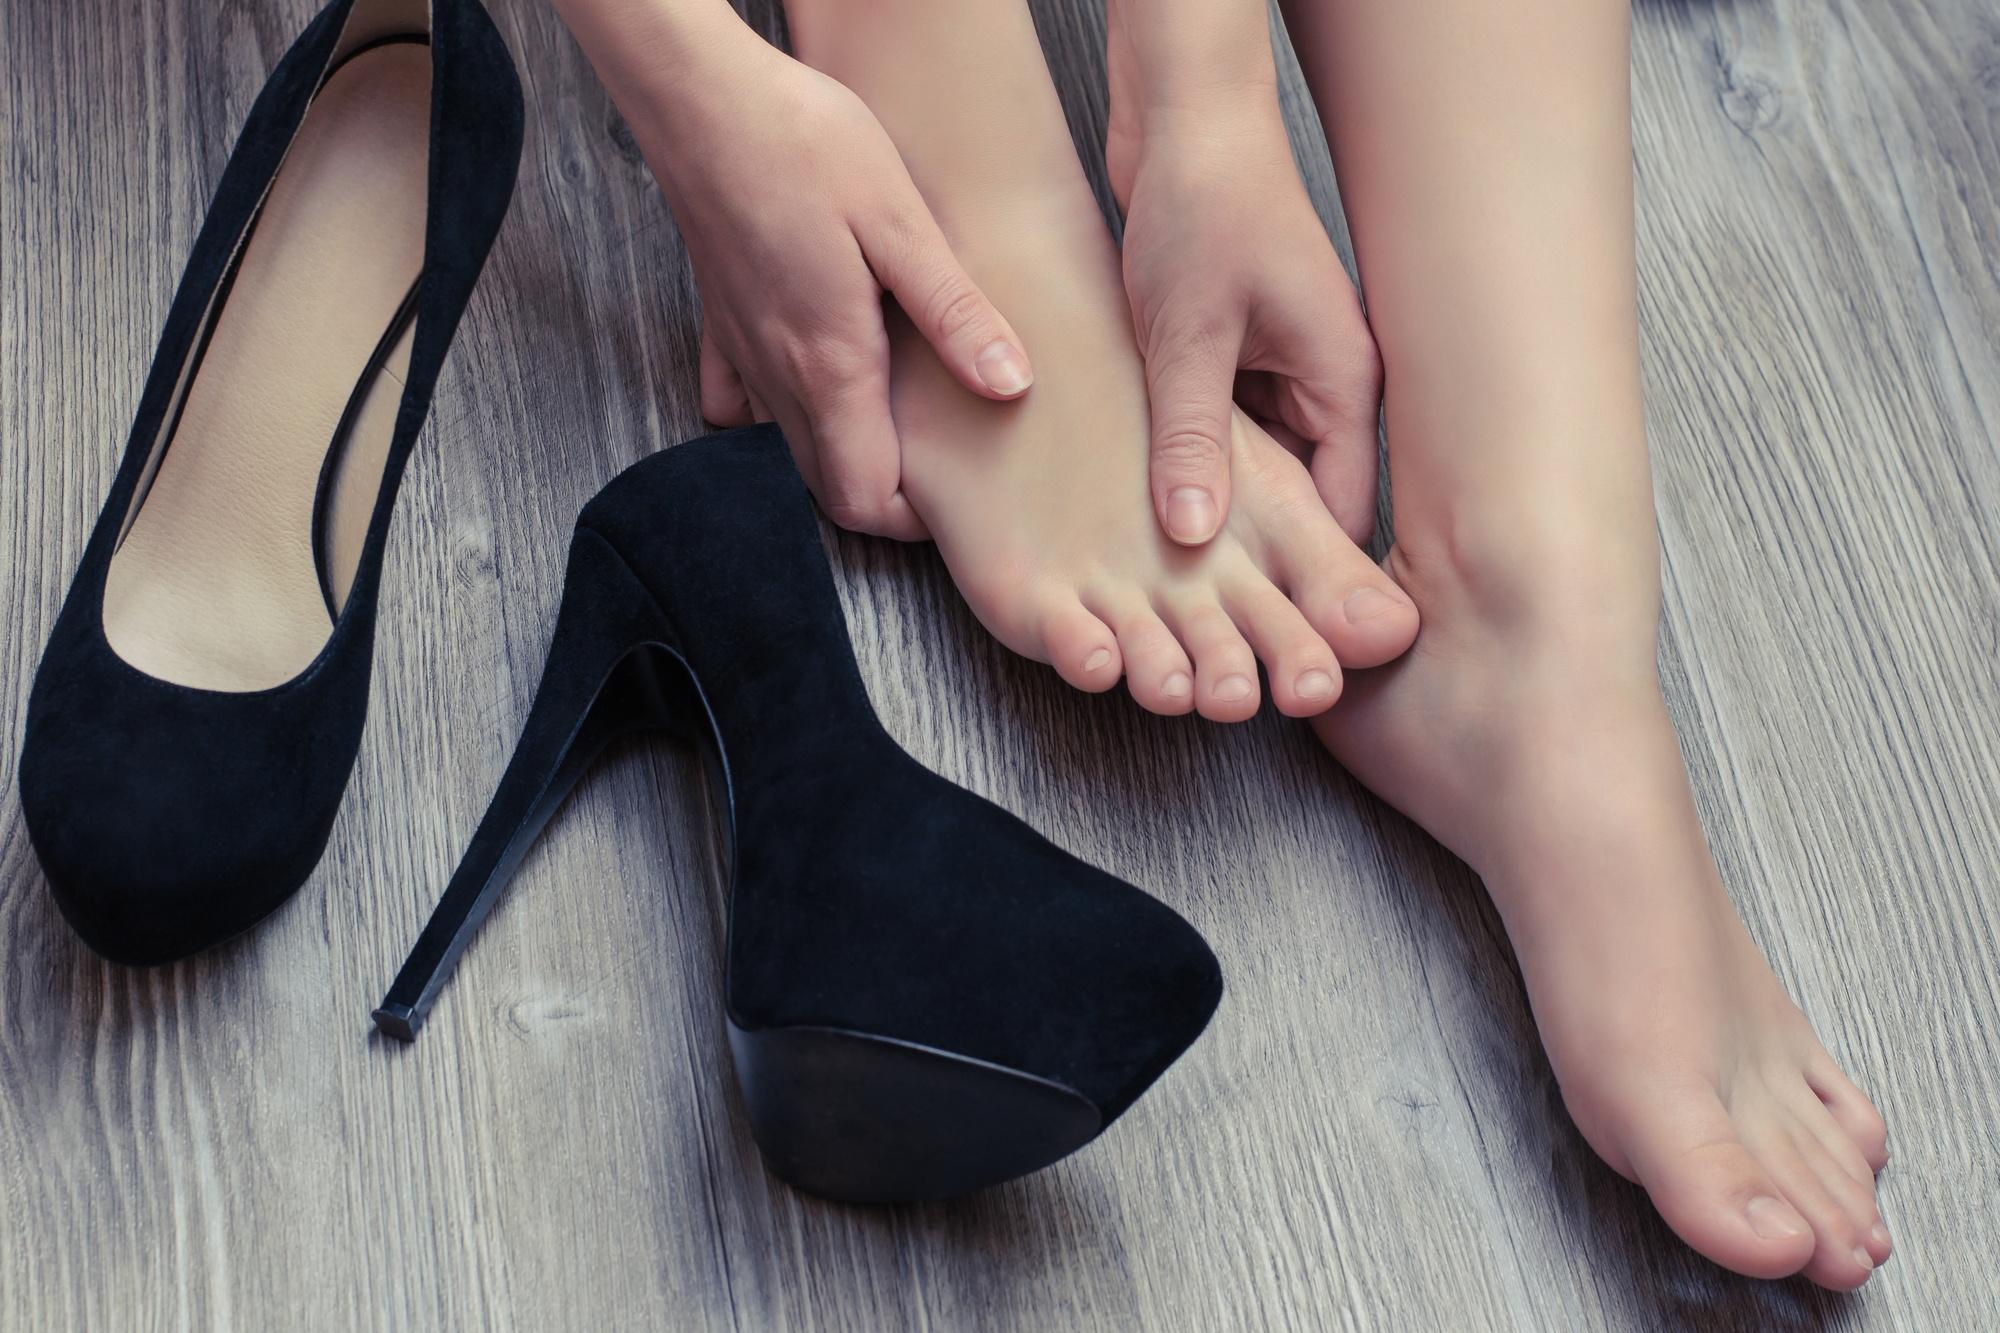 foot pain high heels woman feet rub height lengthening women surgery cosmetic.jpg